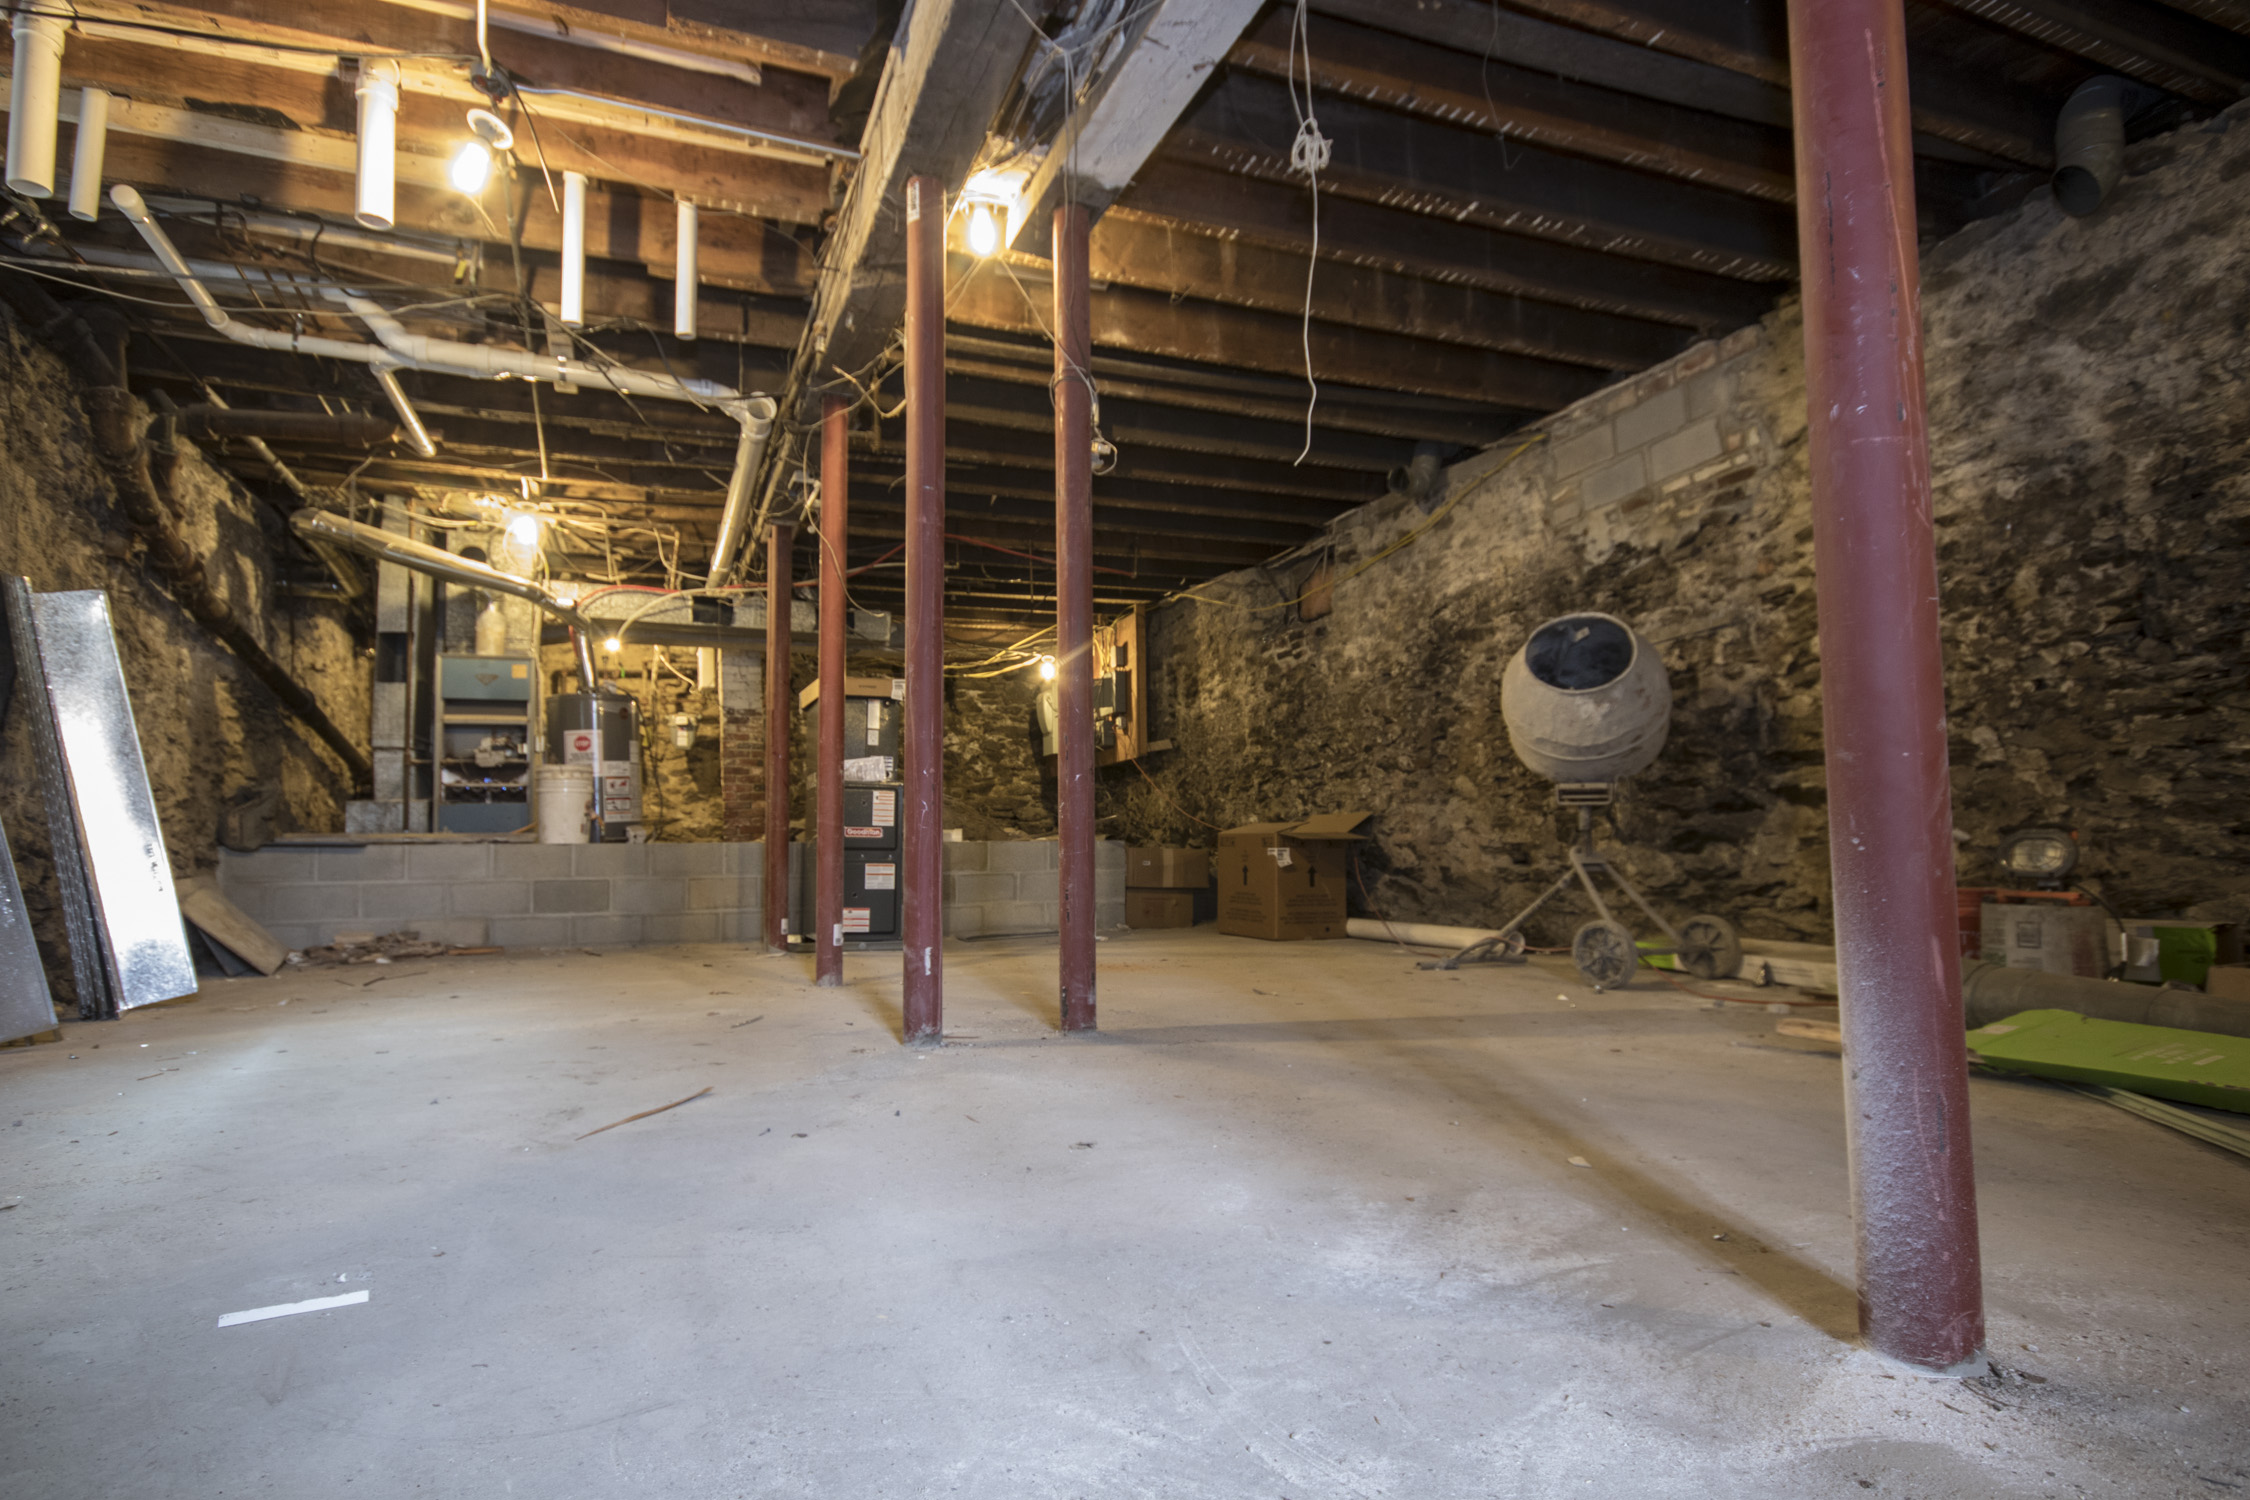 25 darling street homer enovation boston general contractors_1